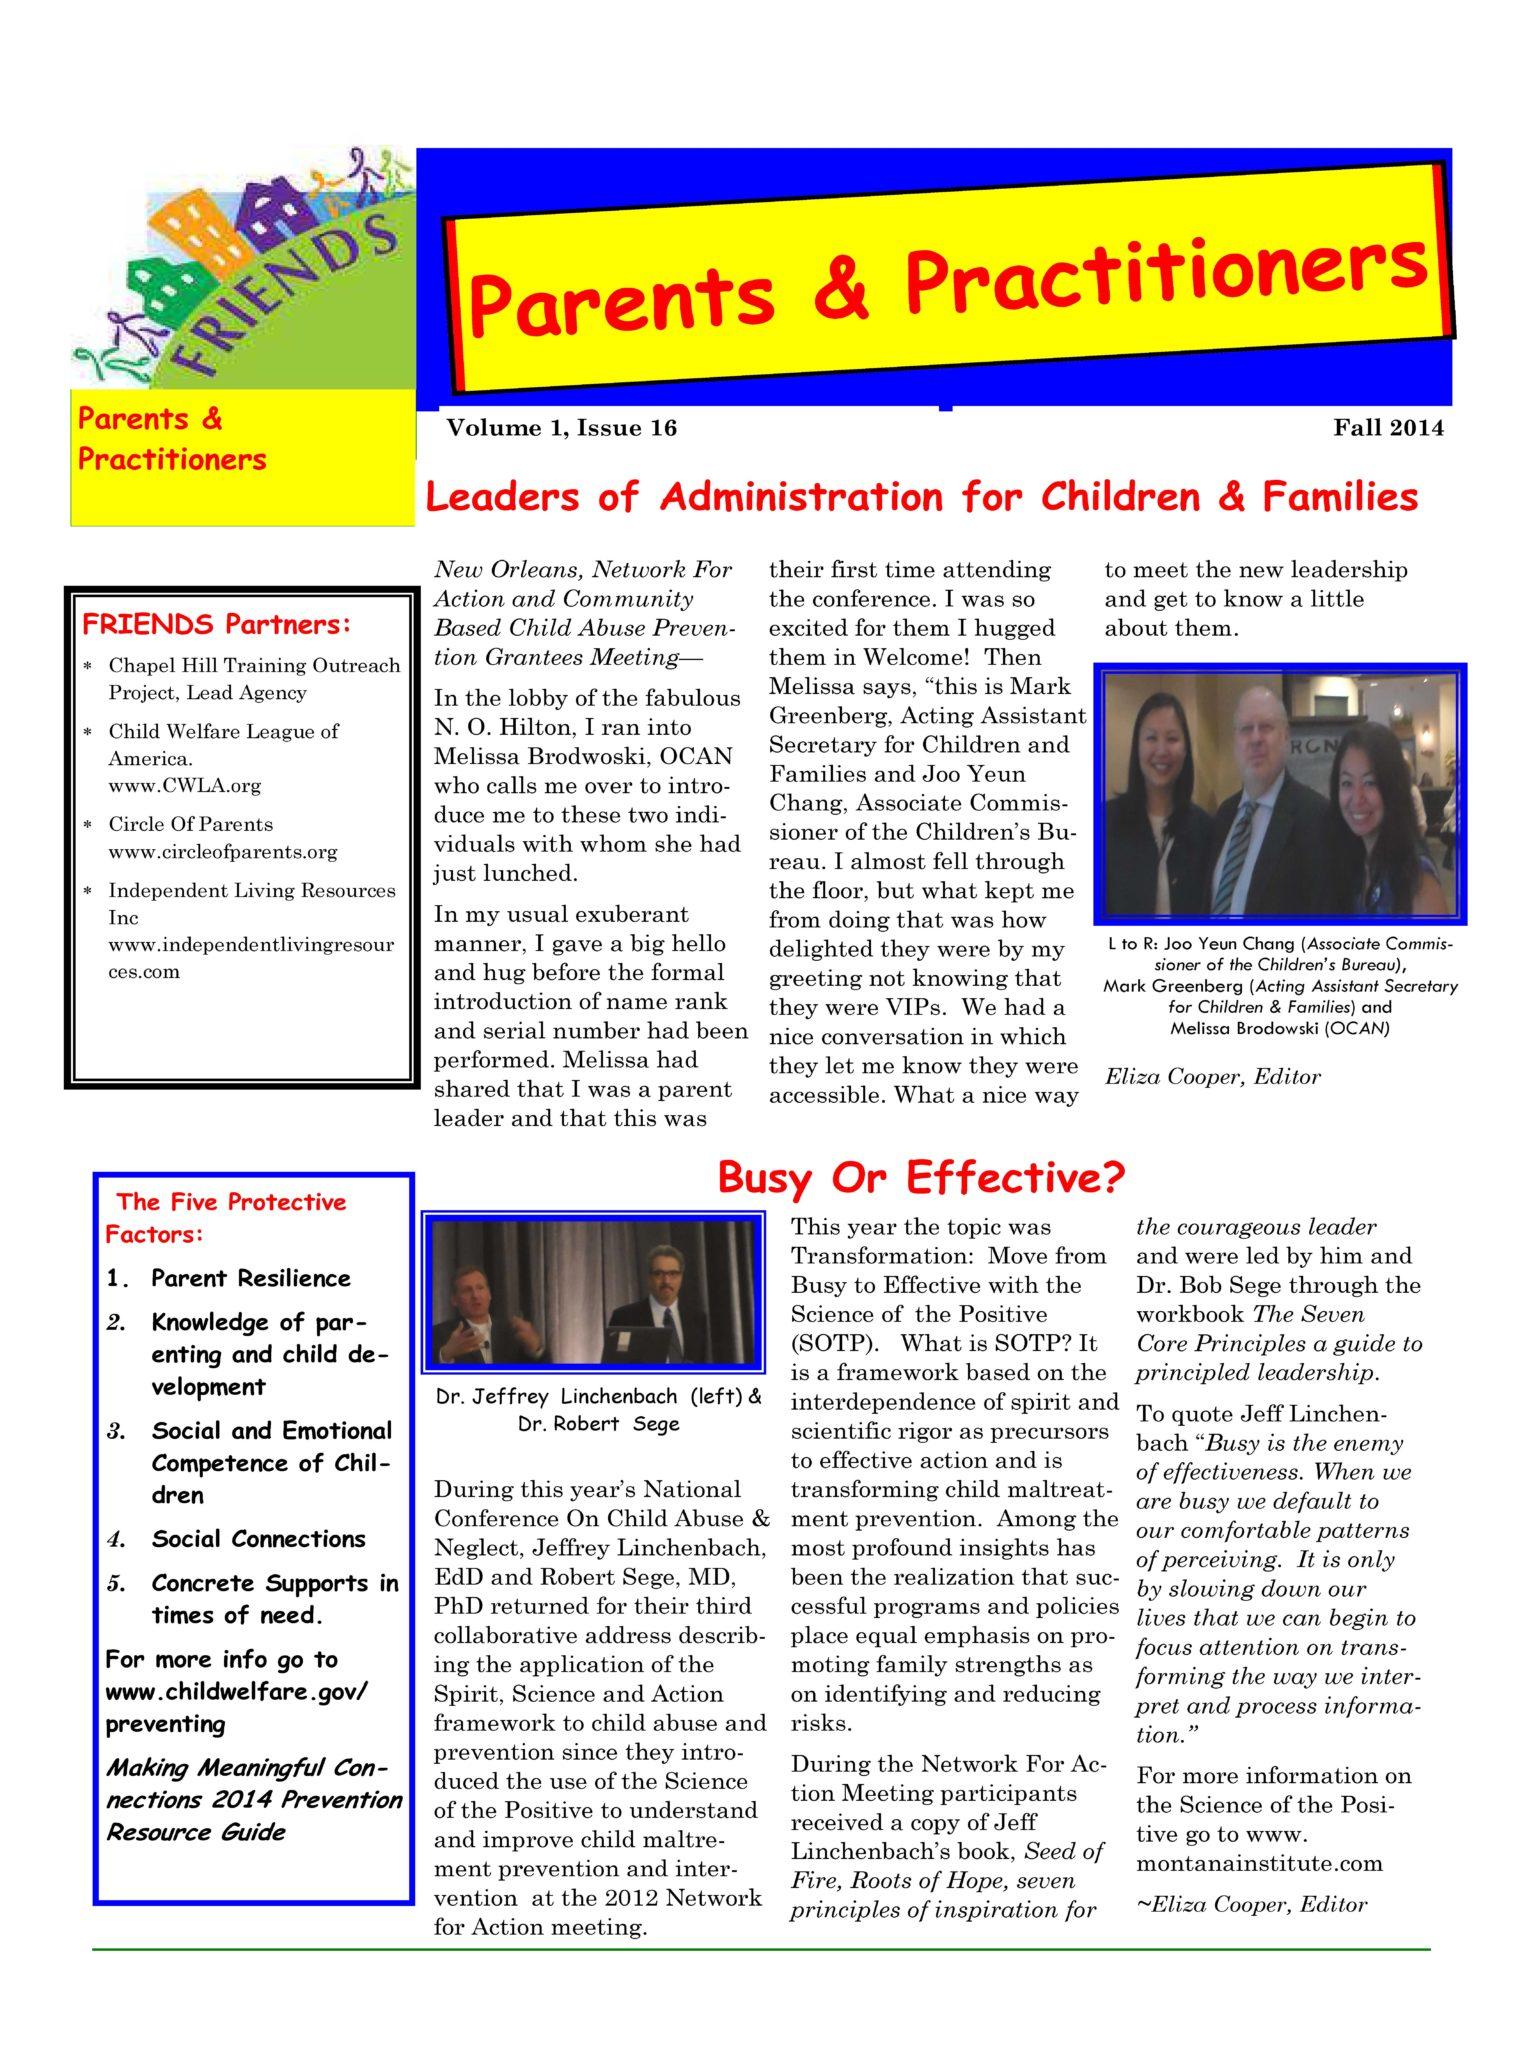 Parent & Practitioner Newsletter Fall 2014